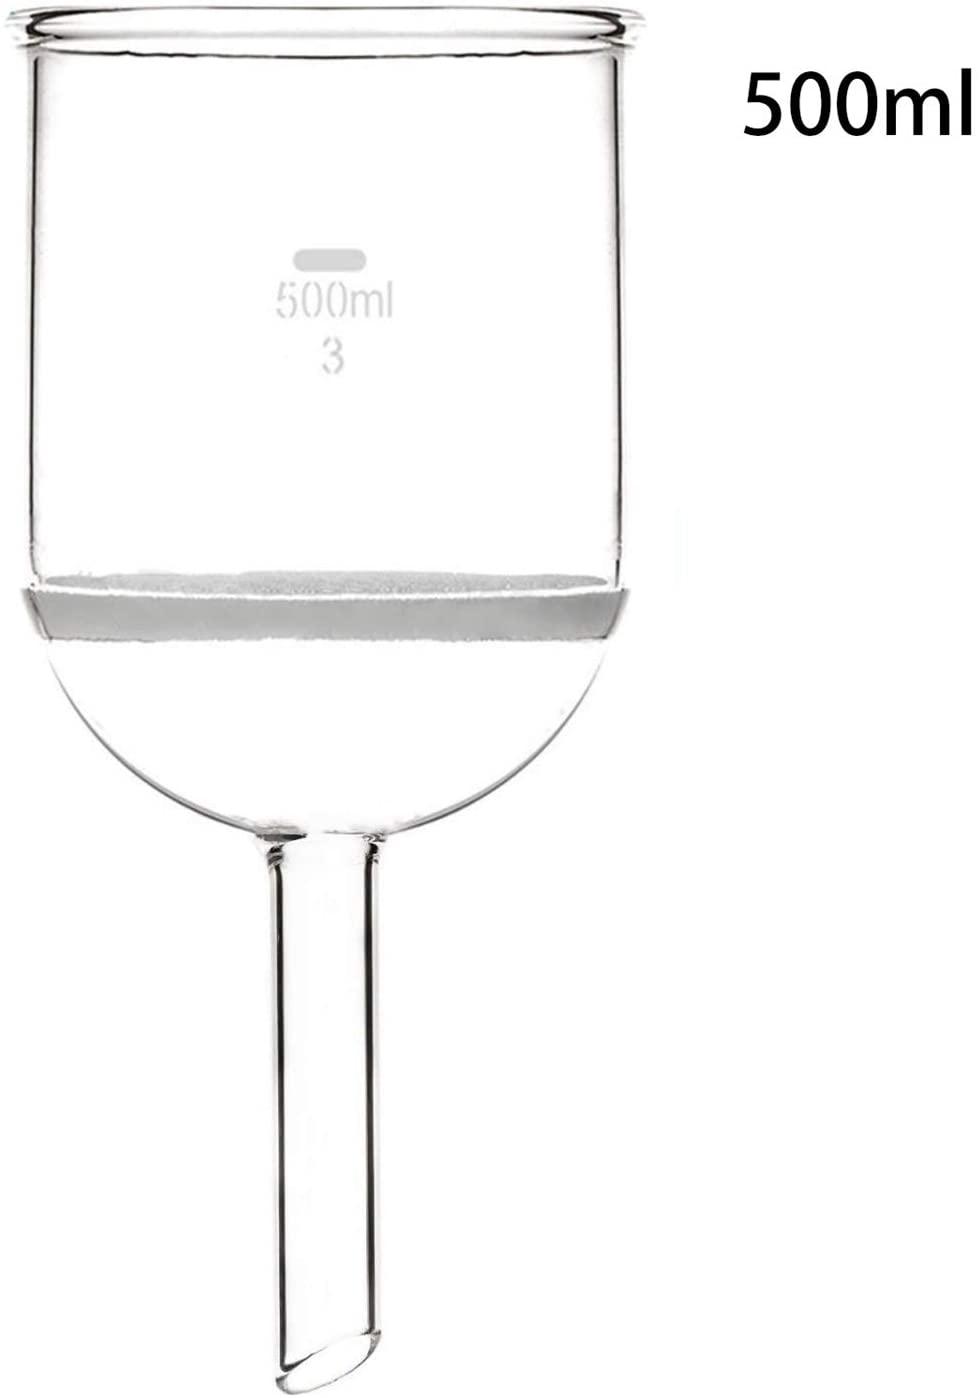 JIANFEI LIANG 500ml Glass Buchner Funnel, Borosilicate Glass 3.3, W/3# Coarse Filter, Straight Tube, Chemistry Labware (Size : 500ml)